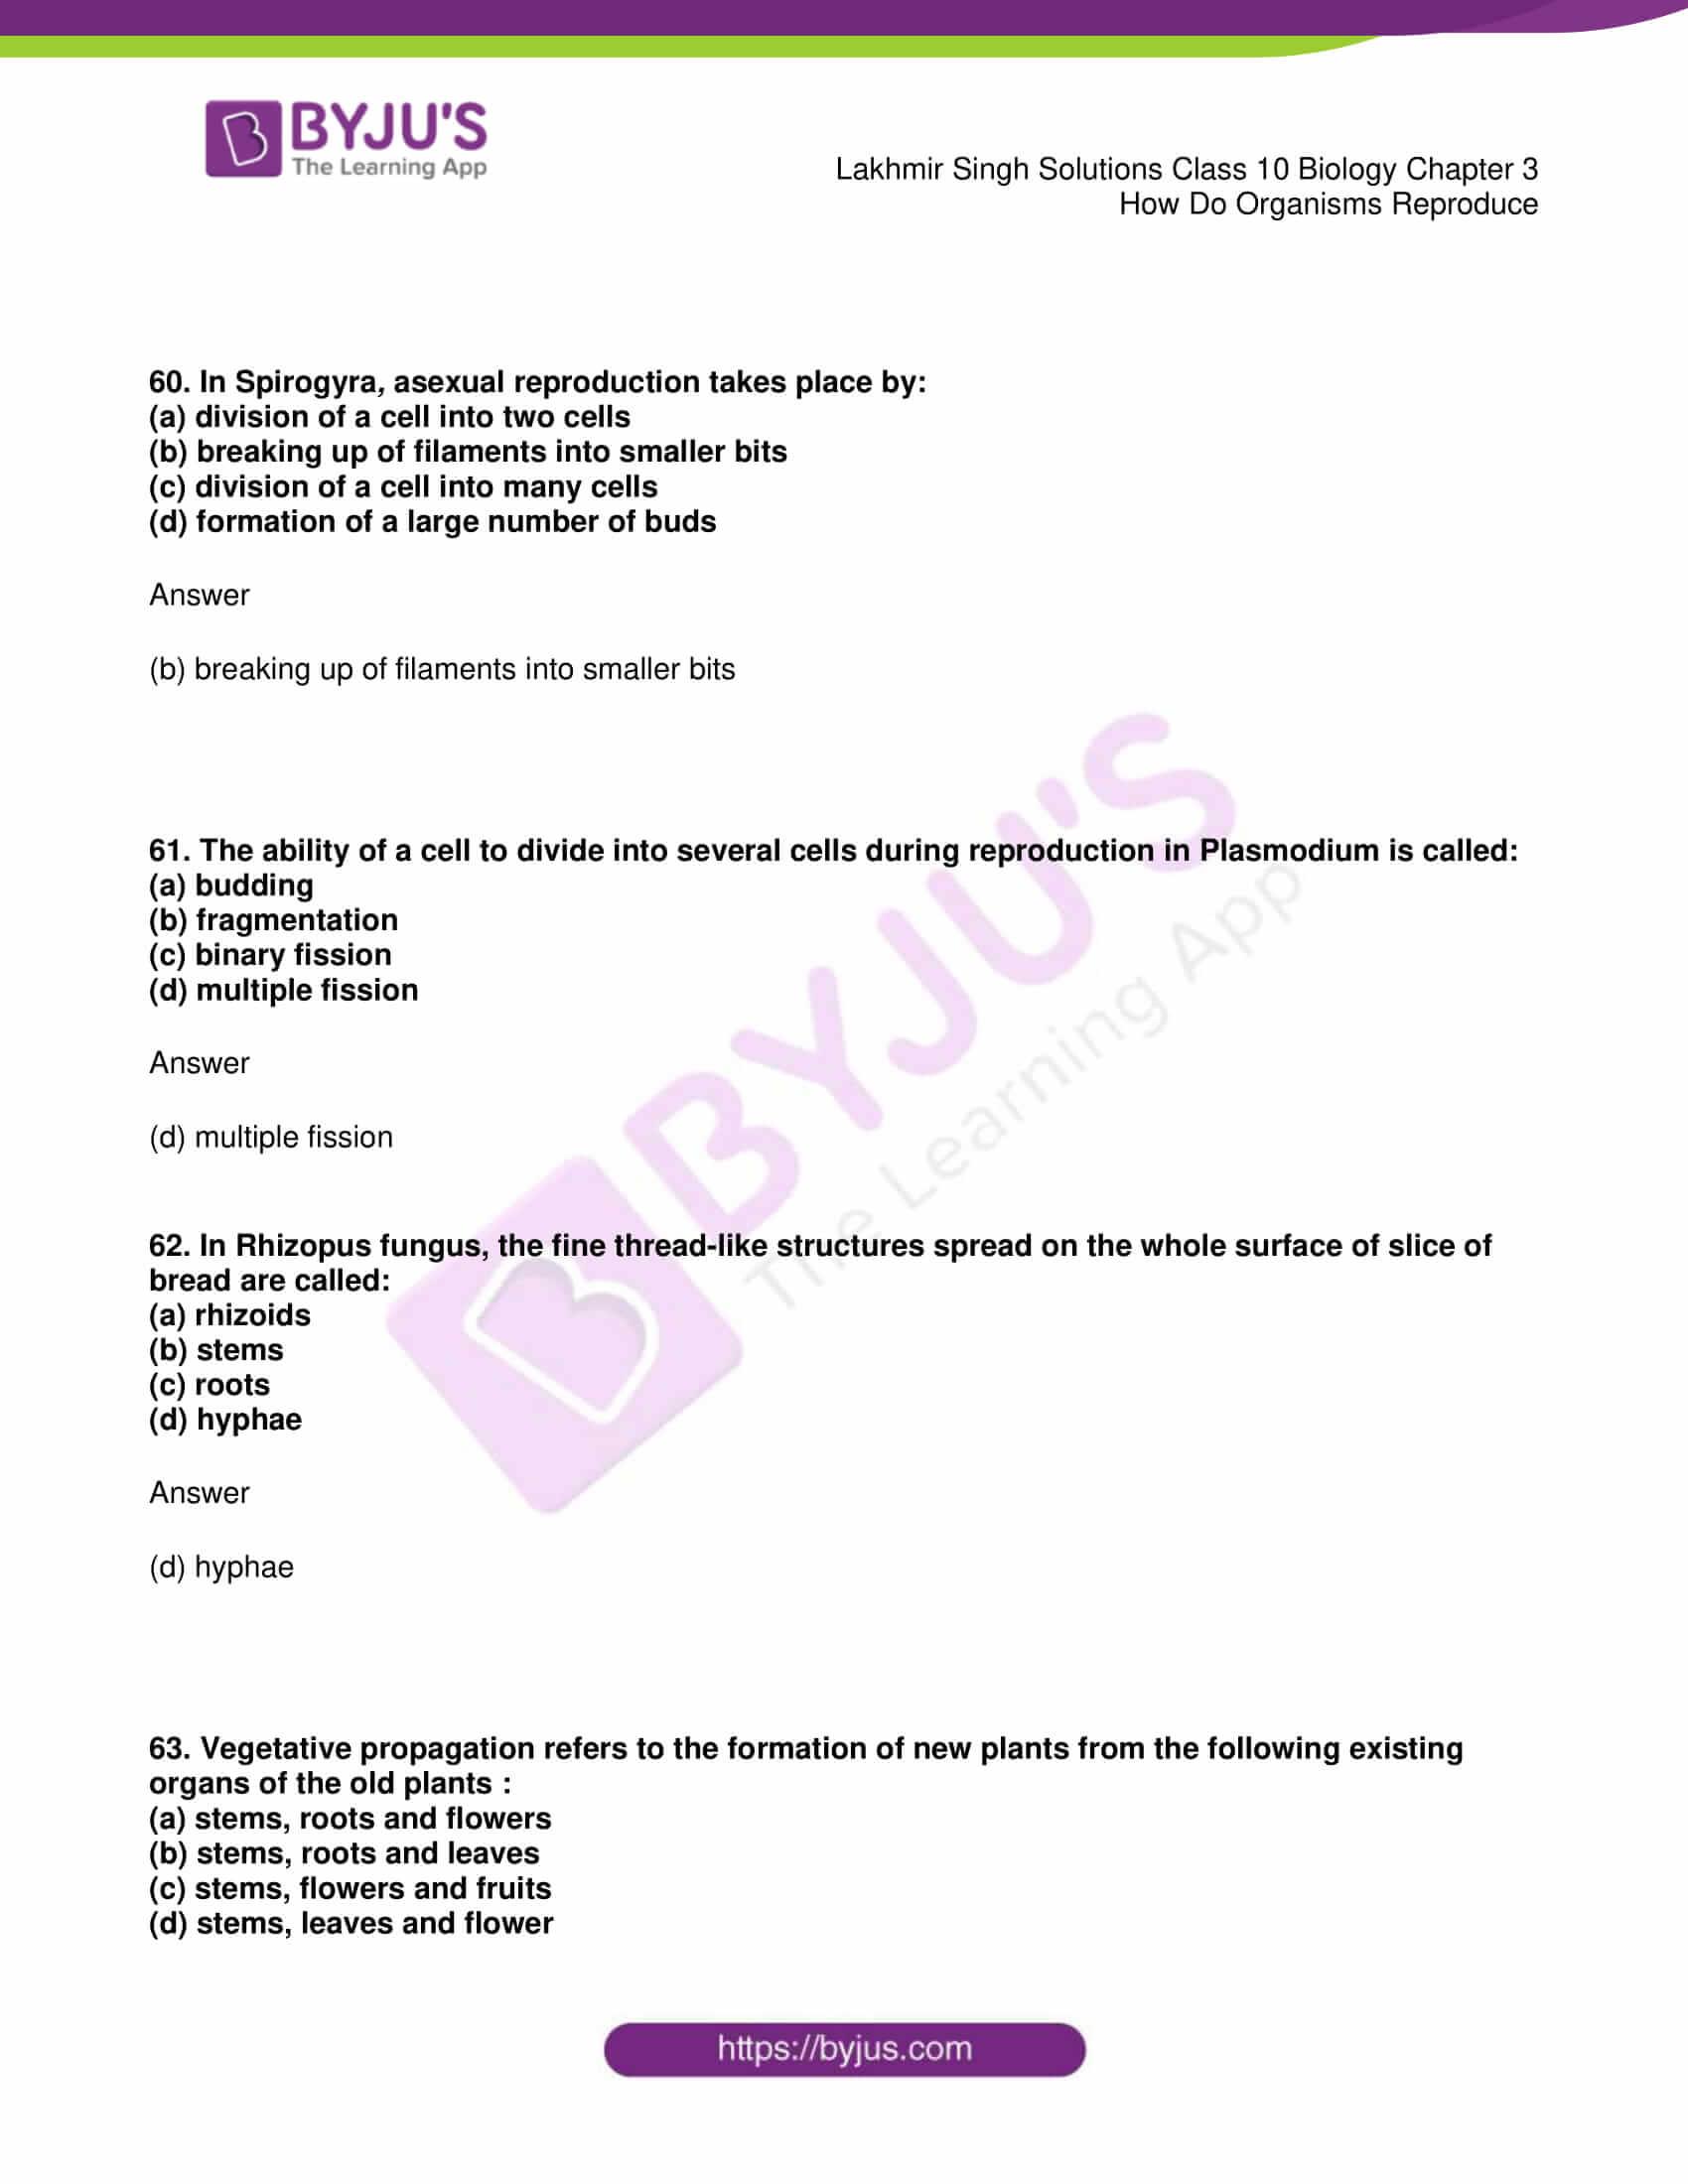 lakhmir singh solutions class 10 biology chapter 3 22